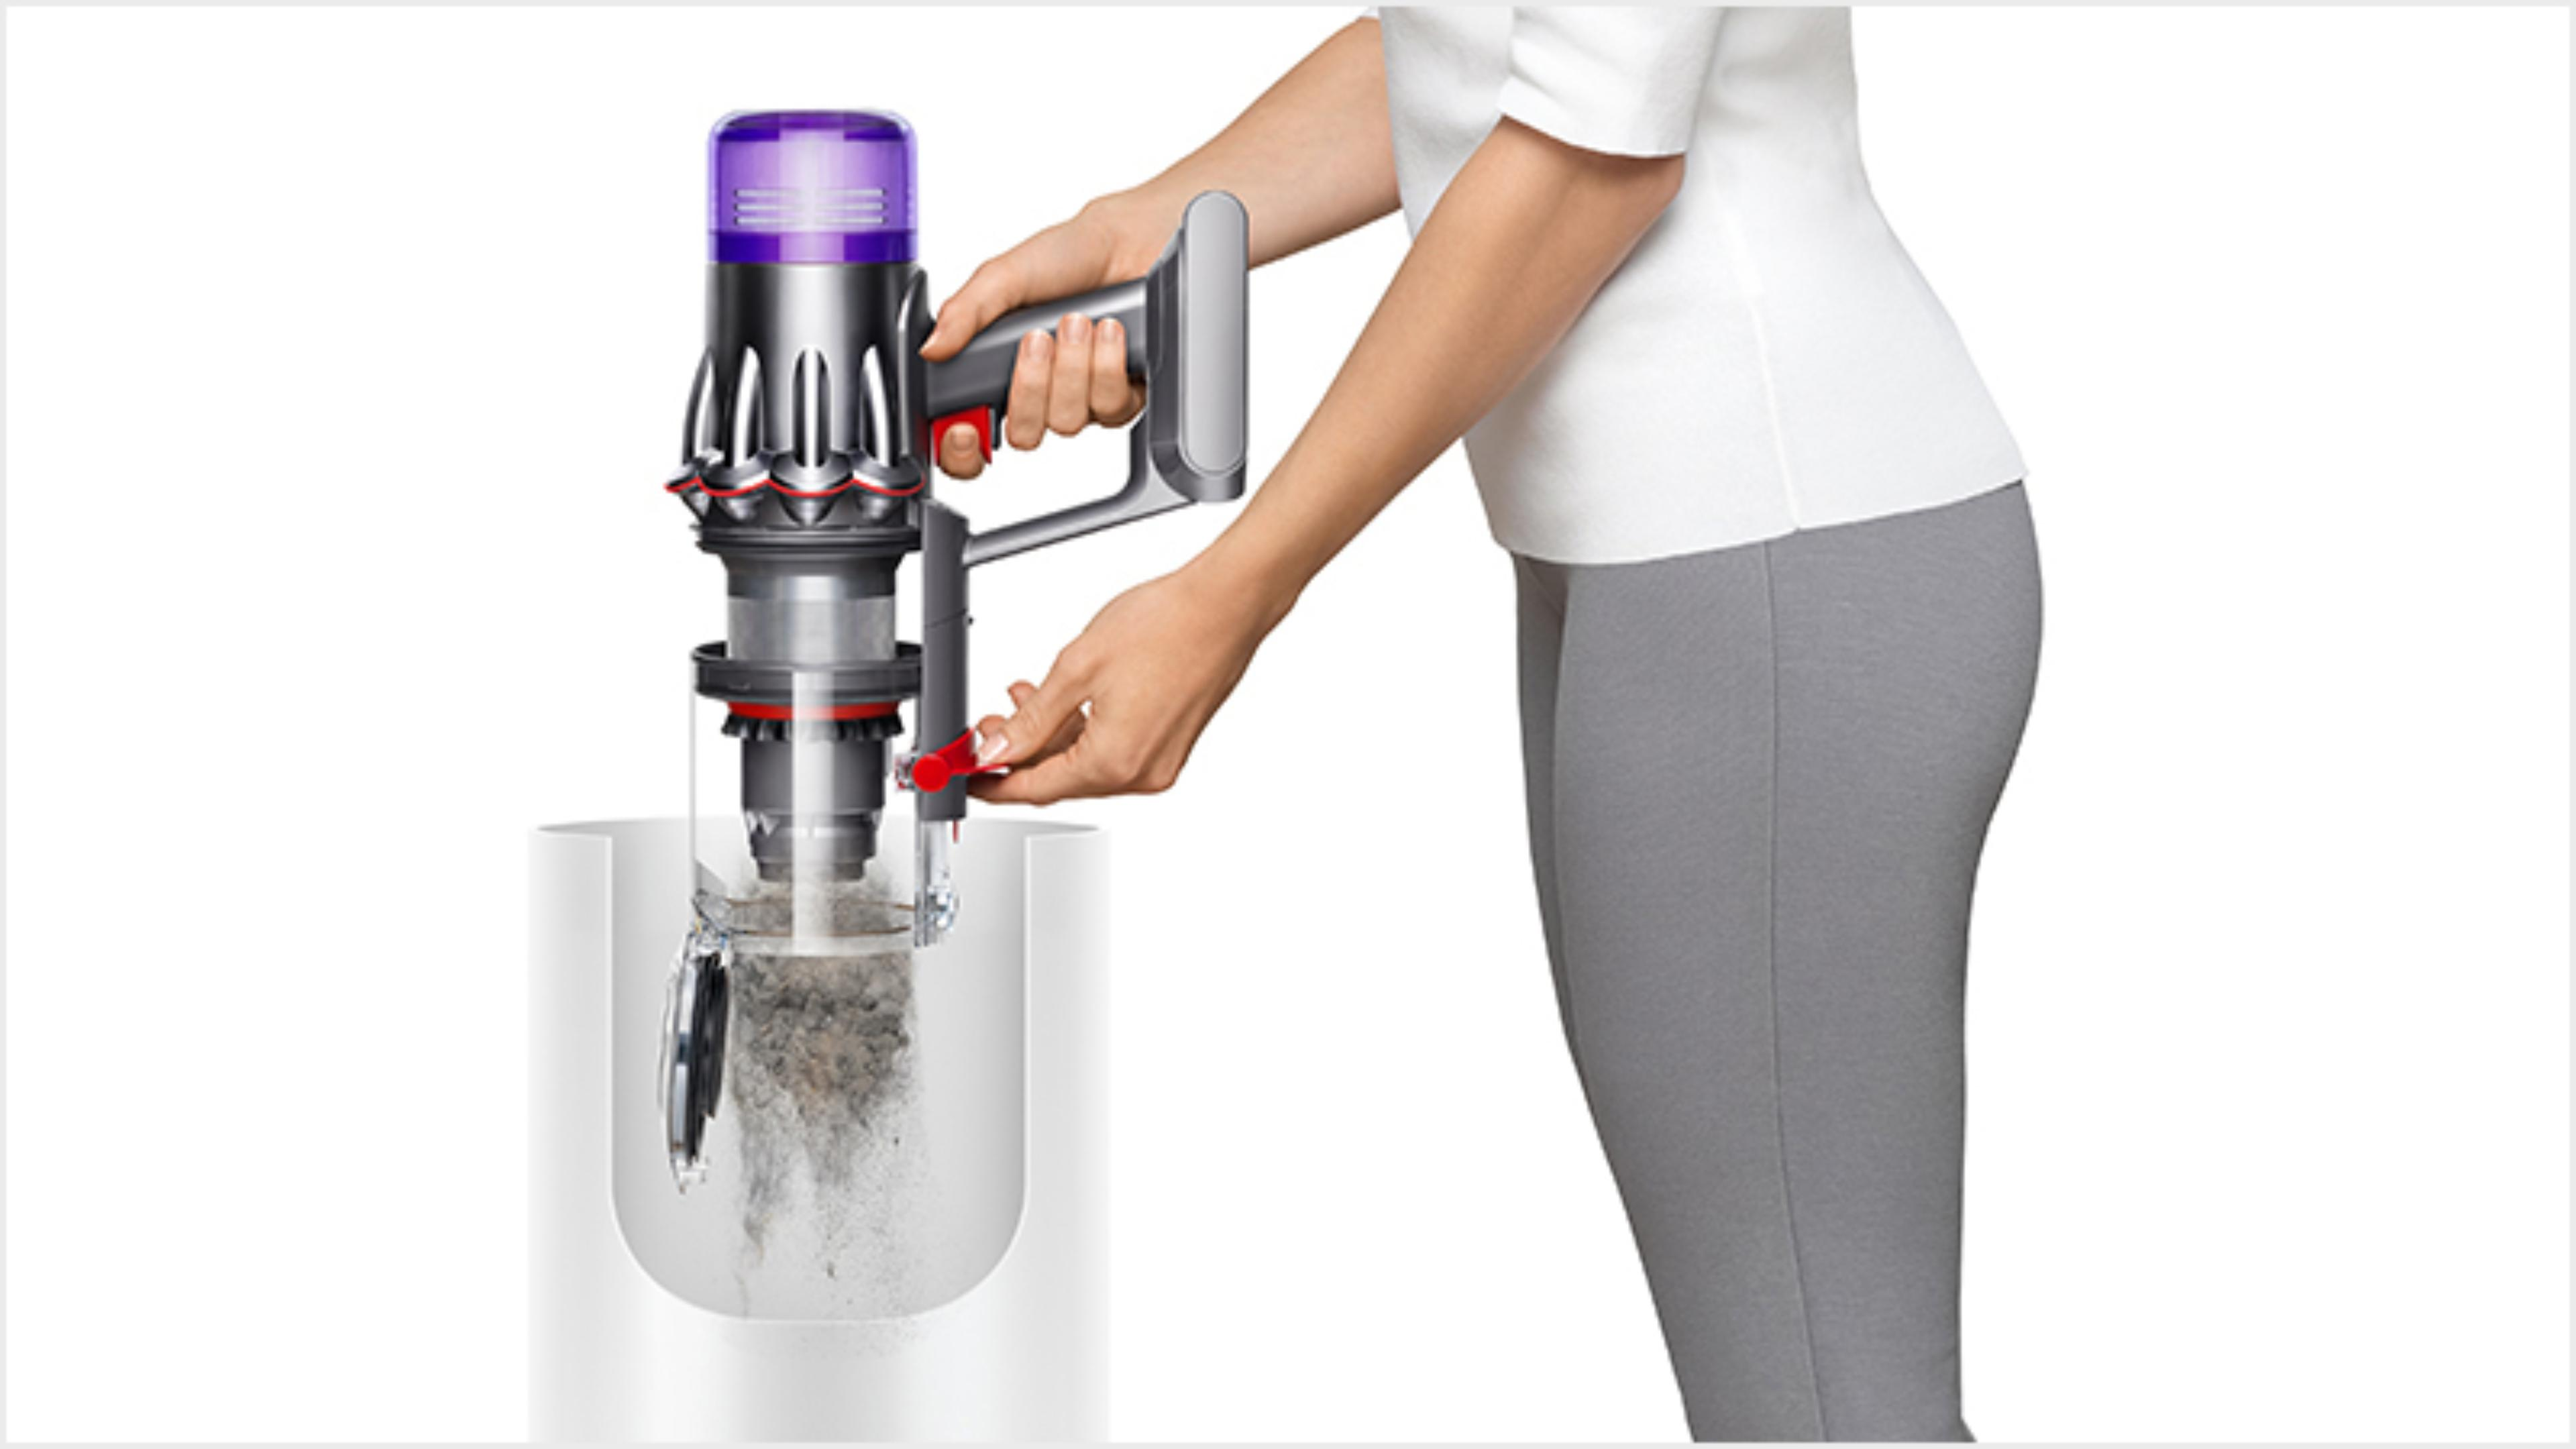 Woman emptying the Dyson Digital Slim vacuum into the bin